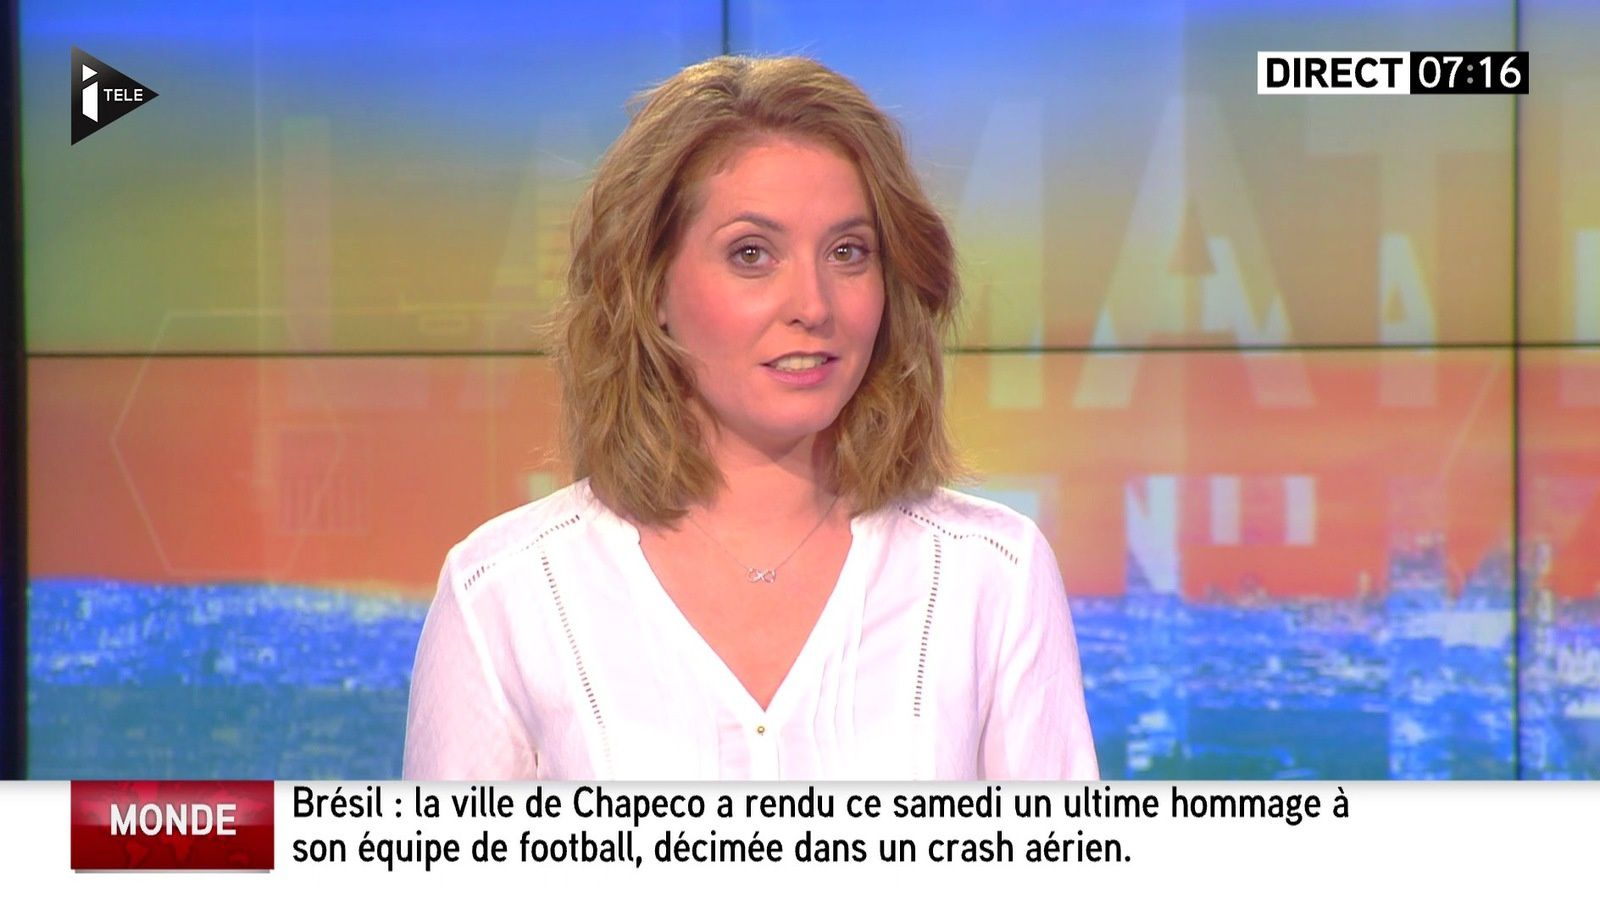 📸 ELODIE POYADE @ElodiePoyade ce matin #WEMATINALE pour LES SPORTS @ITELE #vuesalatele